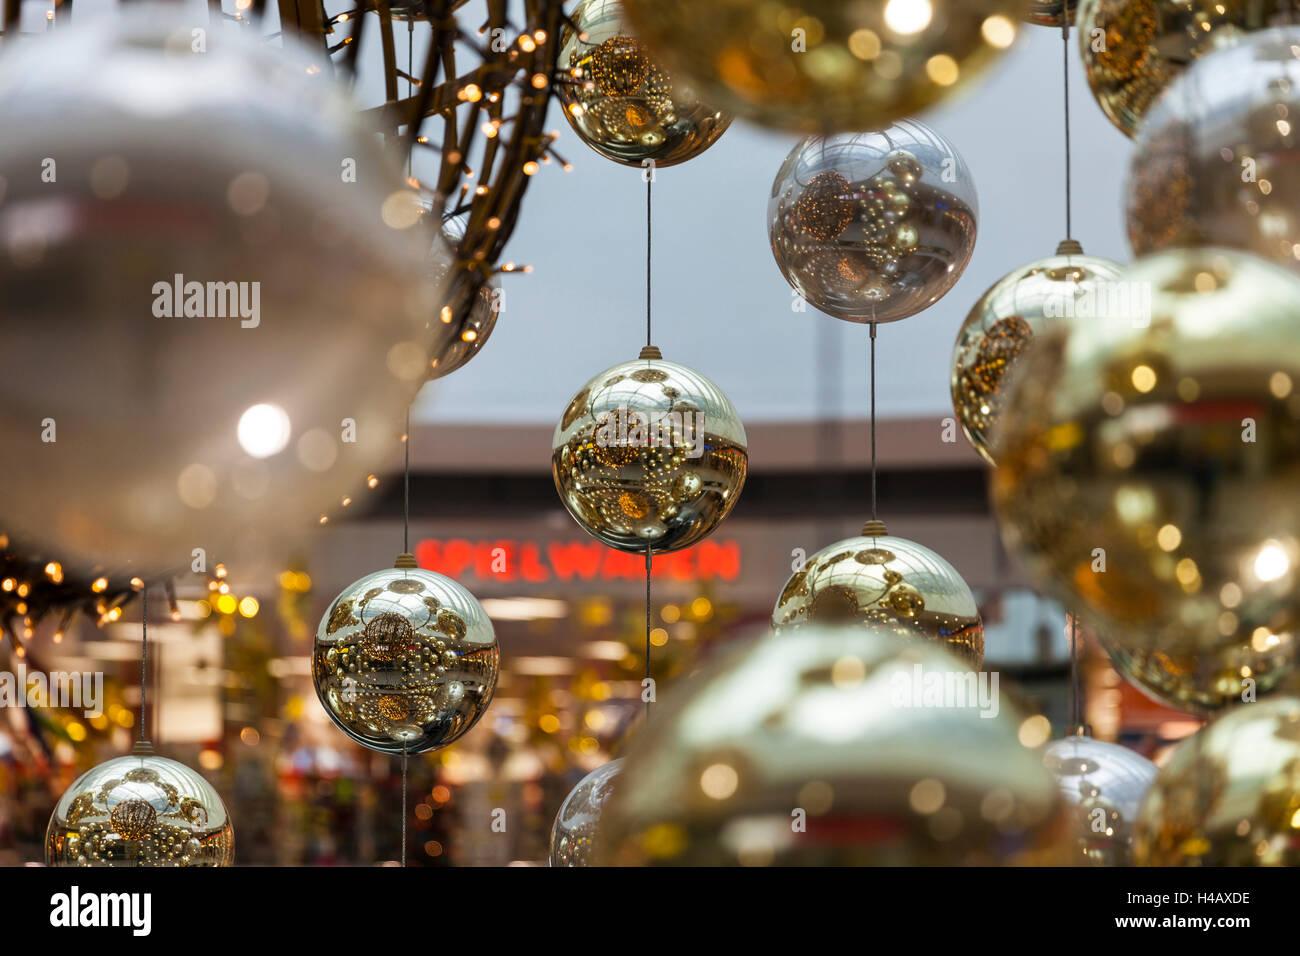 Europe Austria Vienna Westbahnhof Railway Station Toy Shop Stock